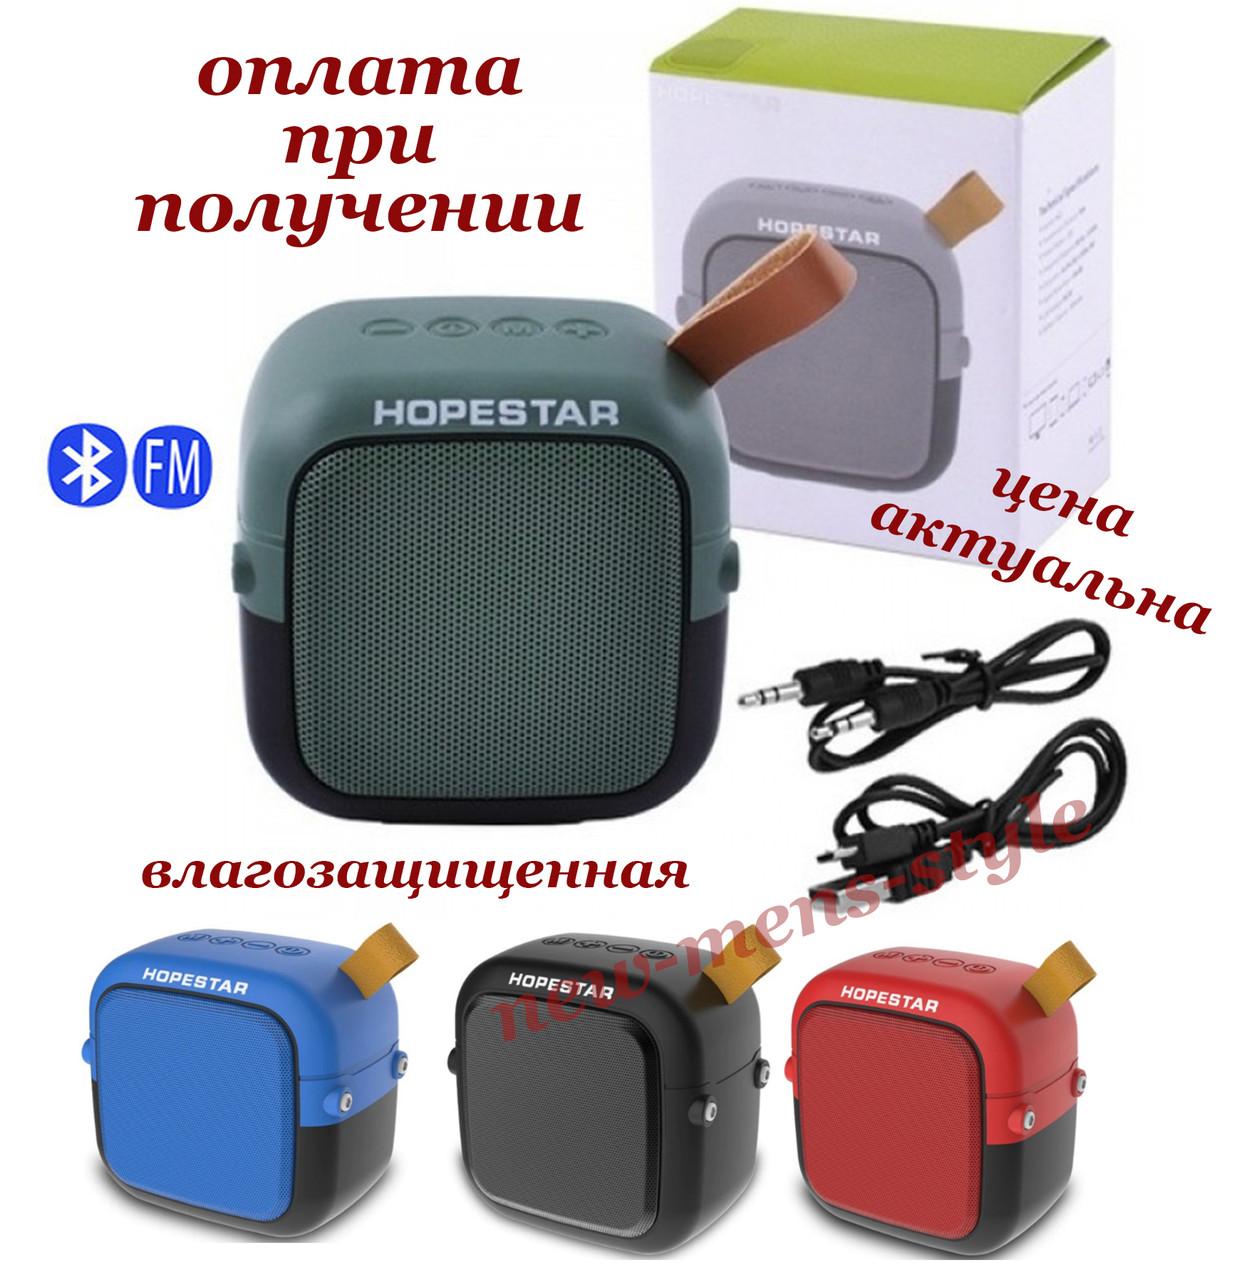 Бездротова мобільна портативна вологозахищена Bluetooth колонка радіо акустика HOPESTAR T5 MINI ГУЧНА